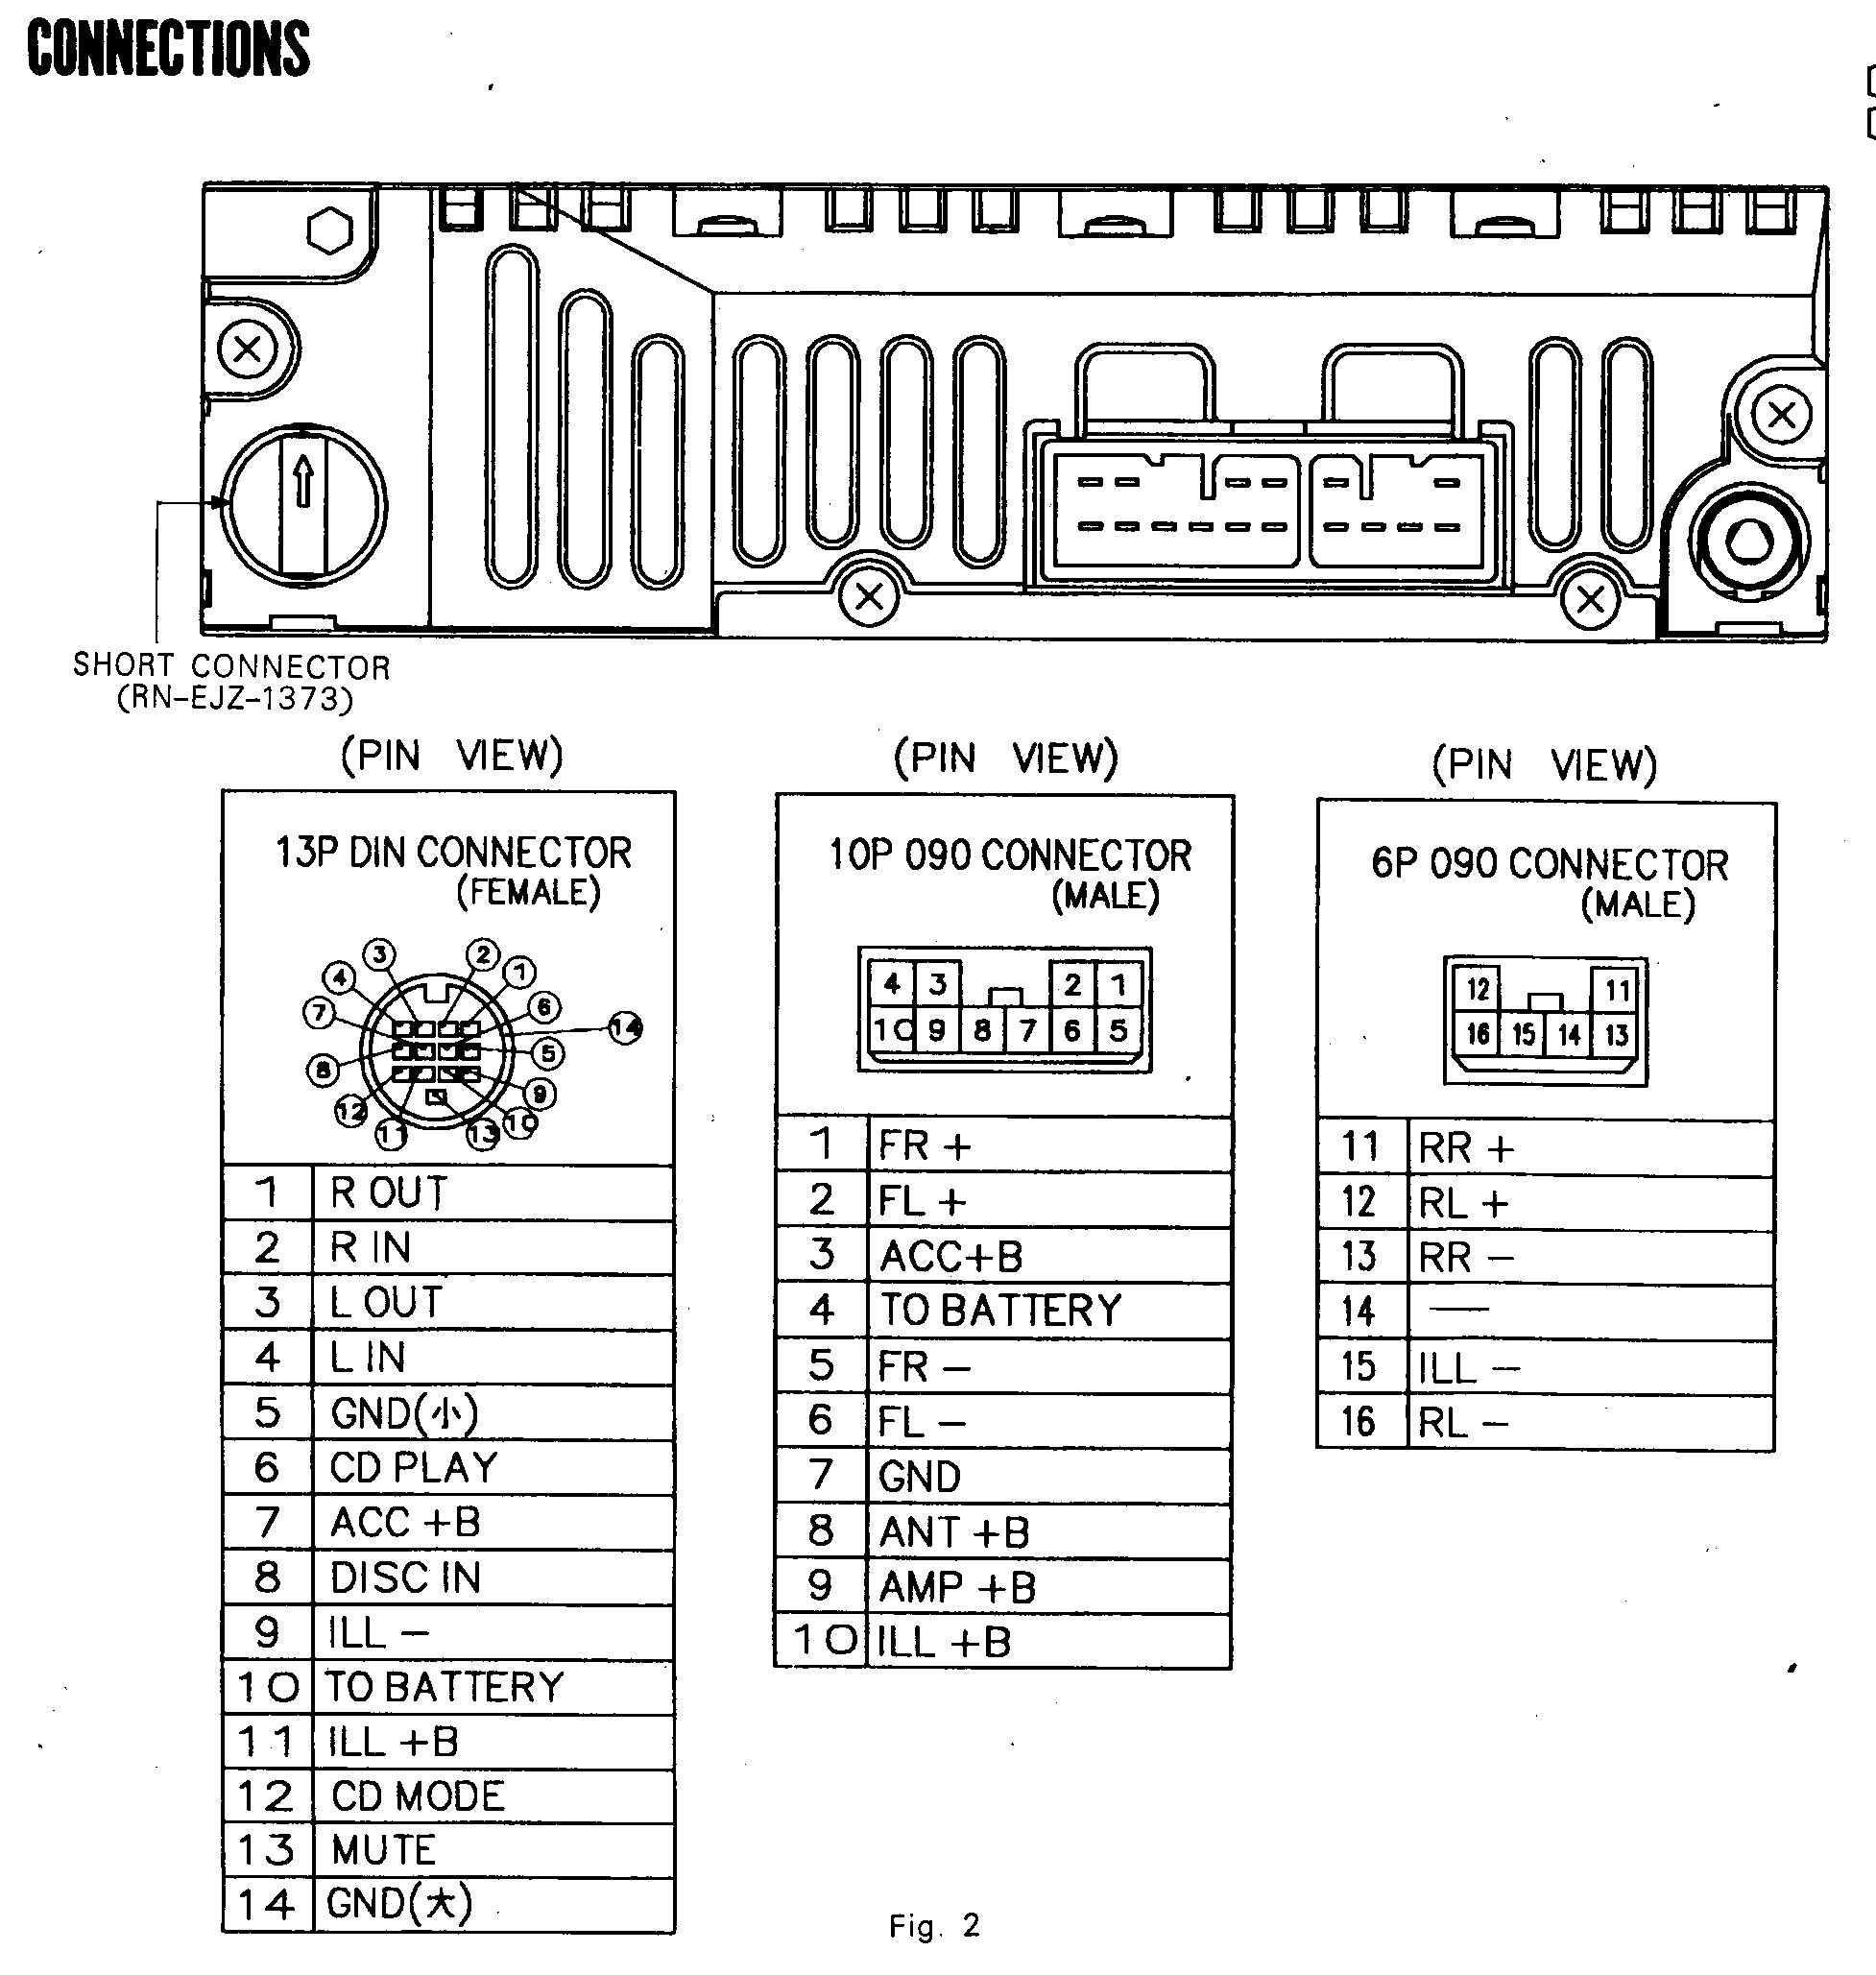 Alpine Car Stereo Wiring Diagram Car Stereo Wiring Diagram Bmw Car Radio Stereo Audio Wiring Diagram Of Alpine Car Stereo Wiring Diagram